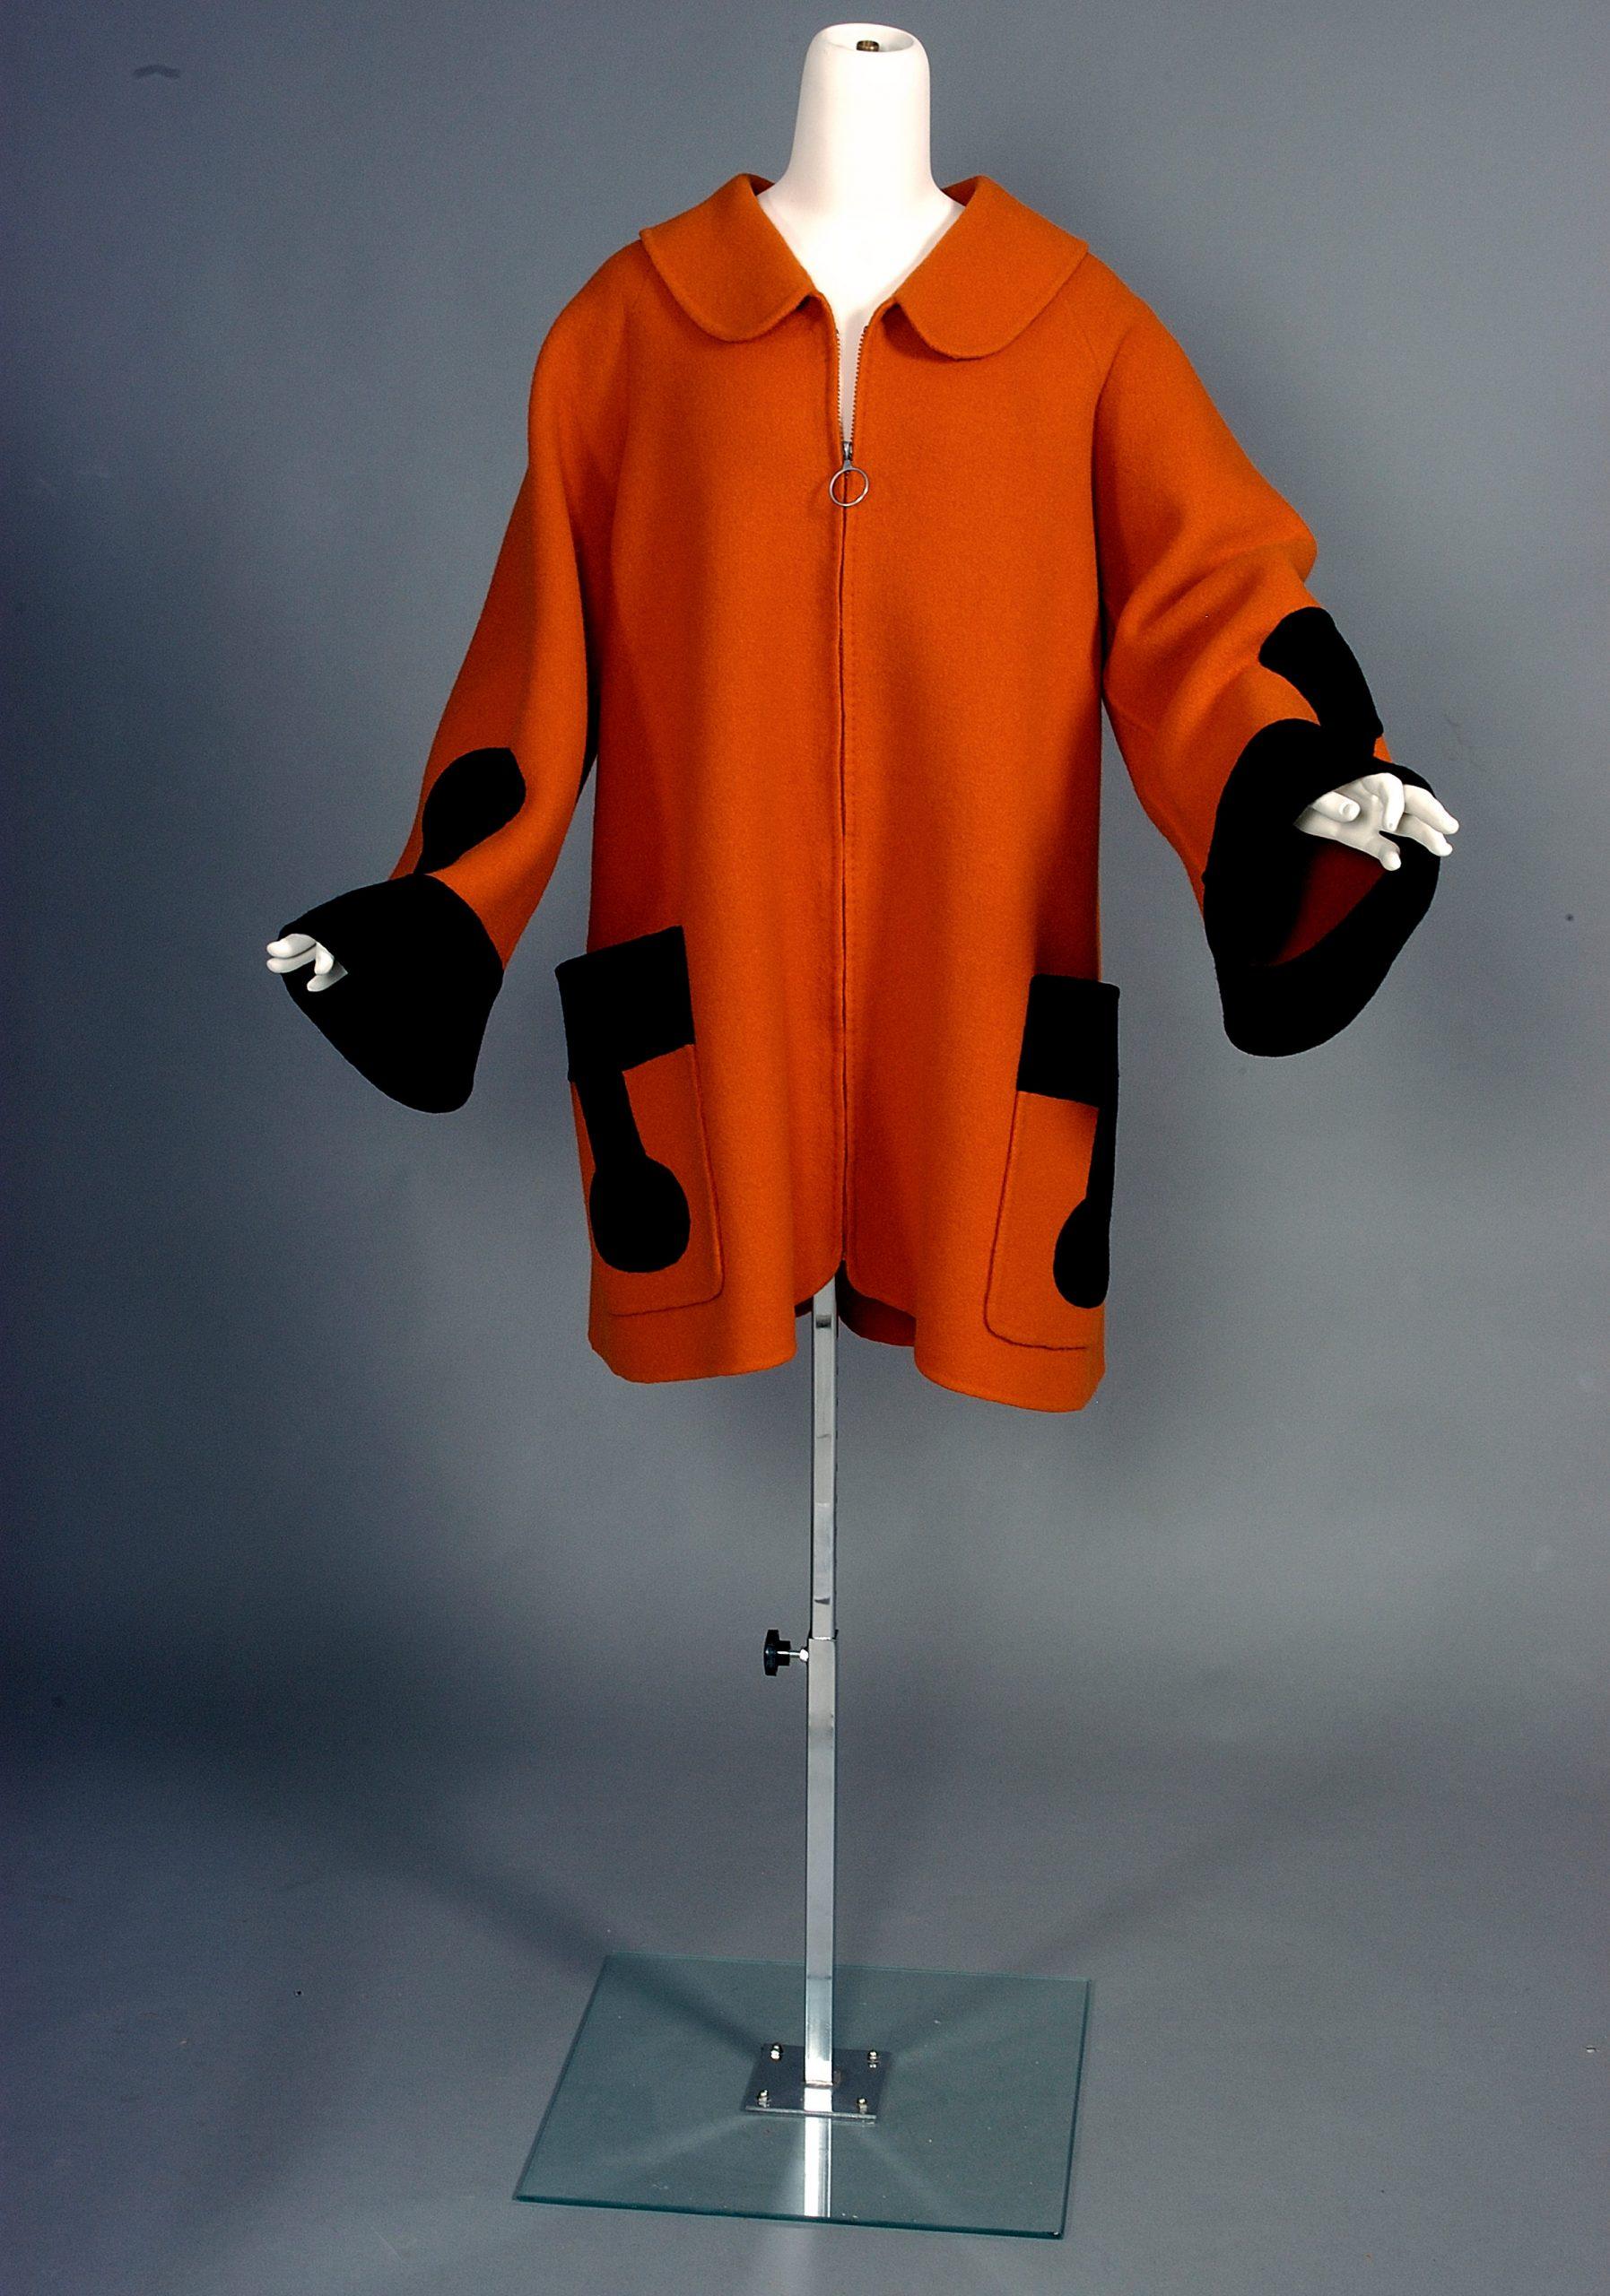 Orange and black coat by Pierre Cardin